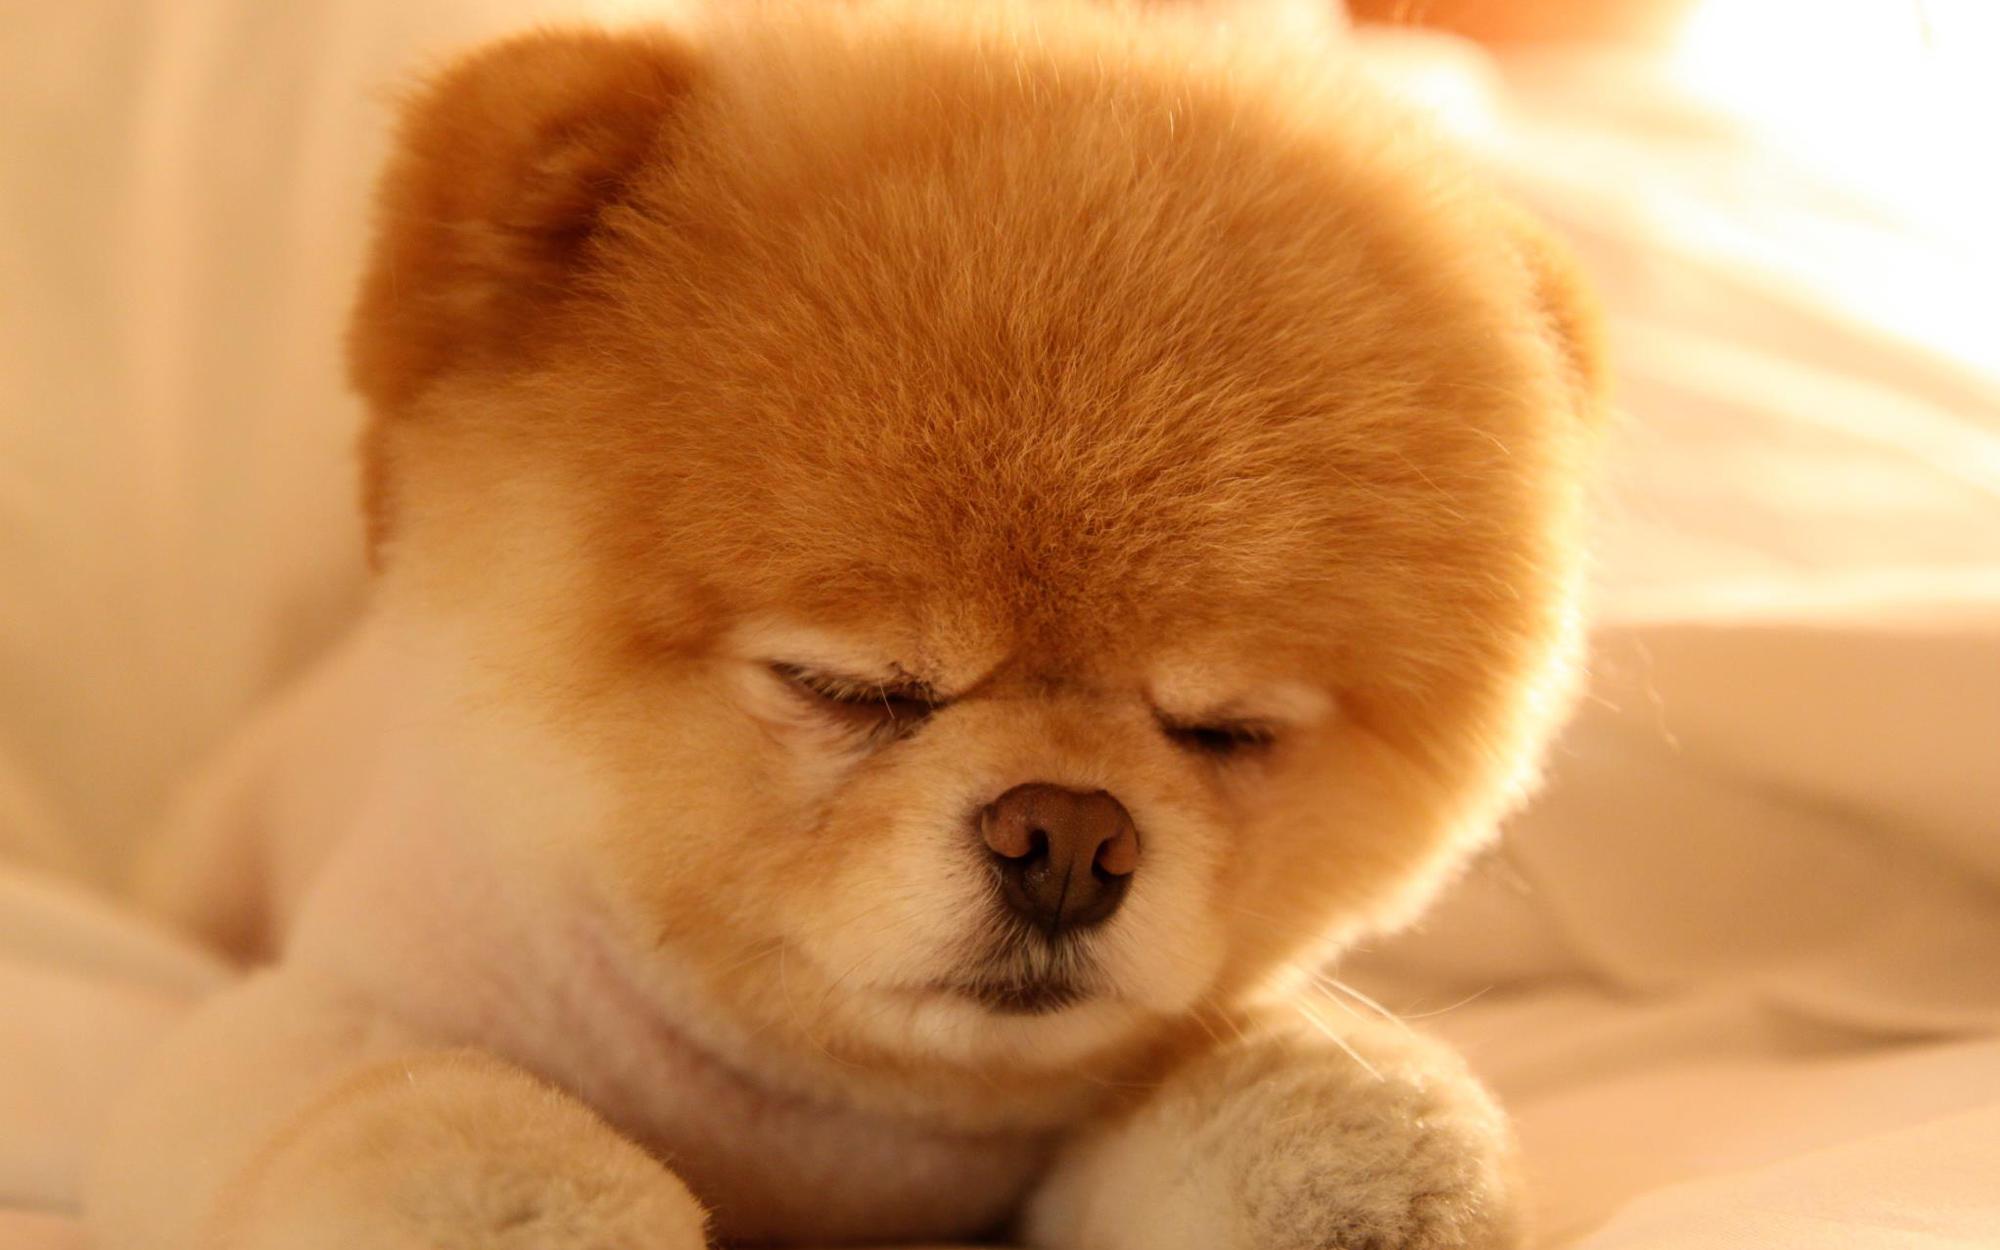 Cute baby dog wallpaper wallpapersafari - The cutest wallpaper ...